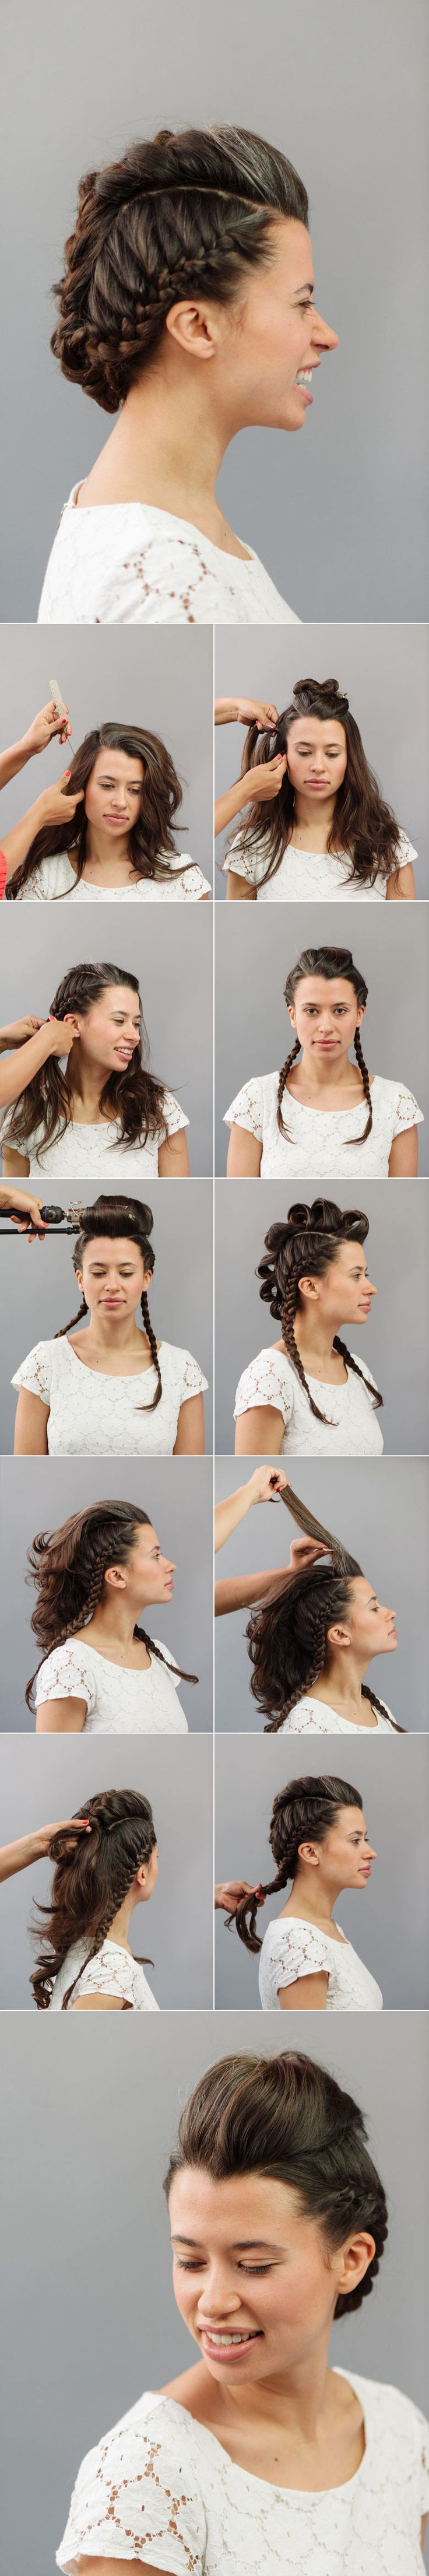 How To High Fashion Faux Hawk